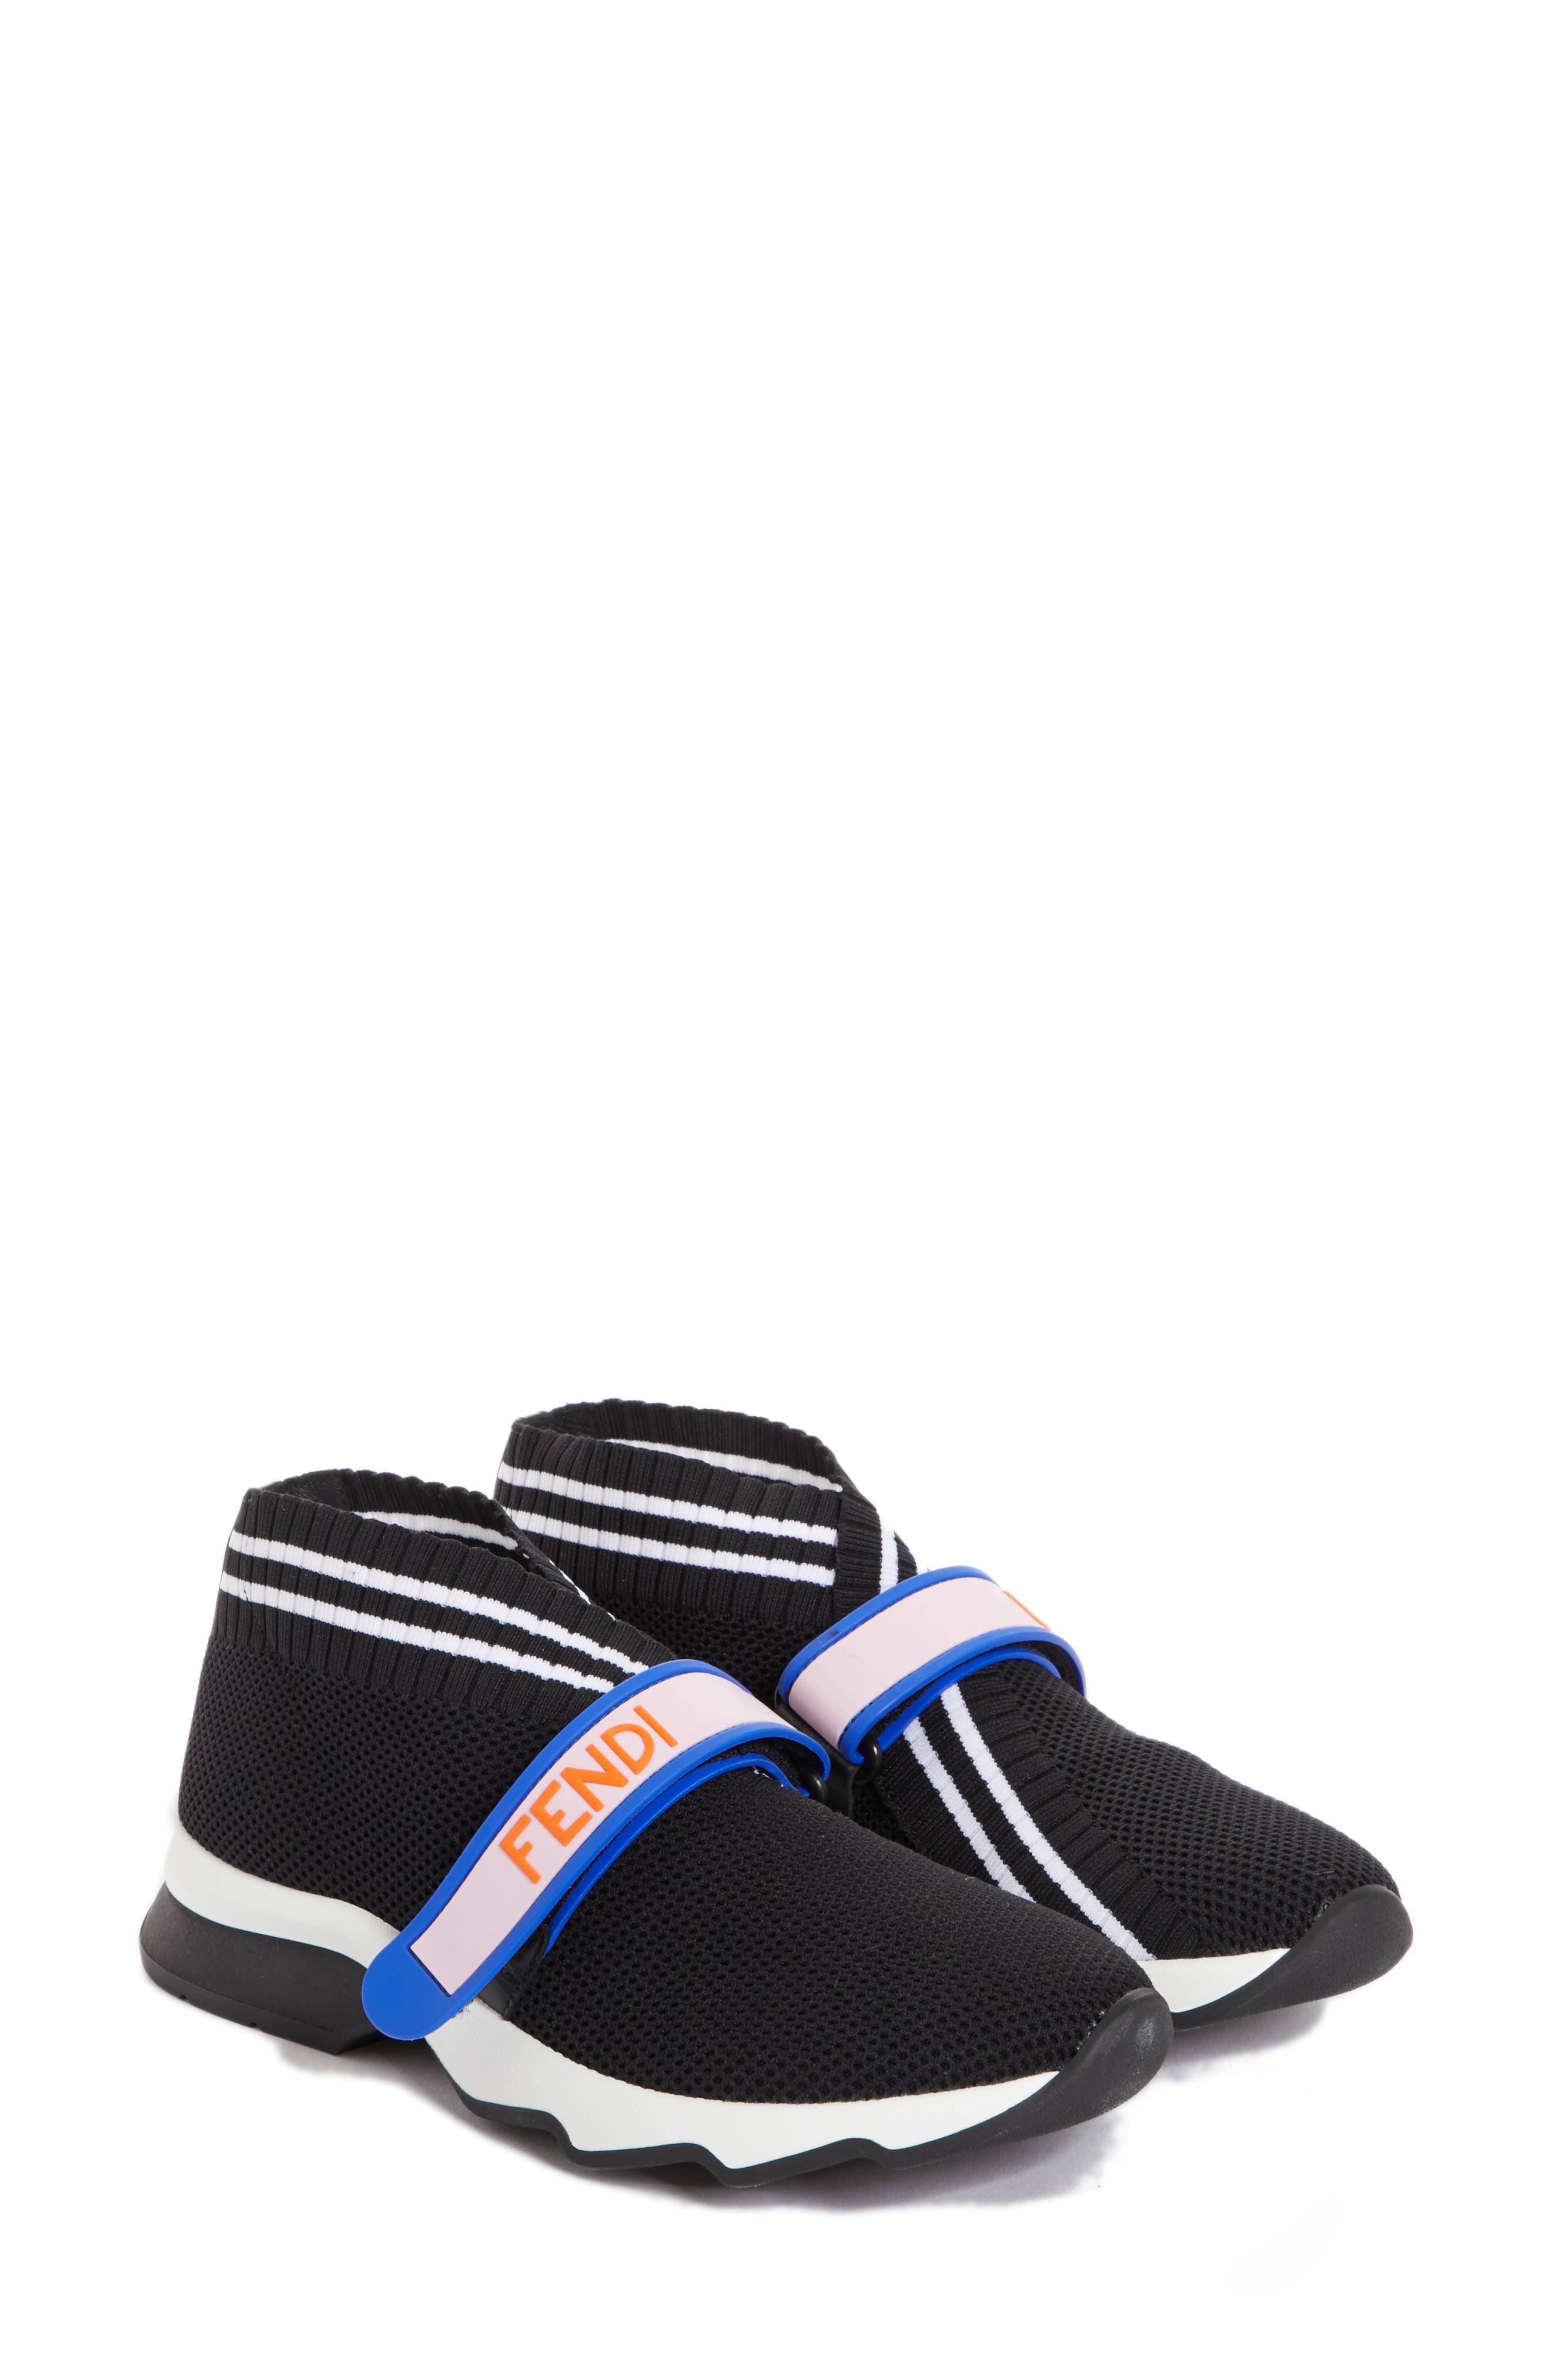 Rockoko Mismatch Sneaker,                             Main thumbnail 1, color,                             Black